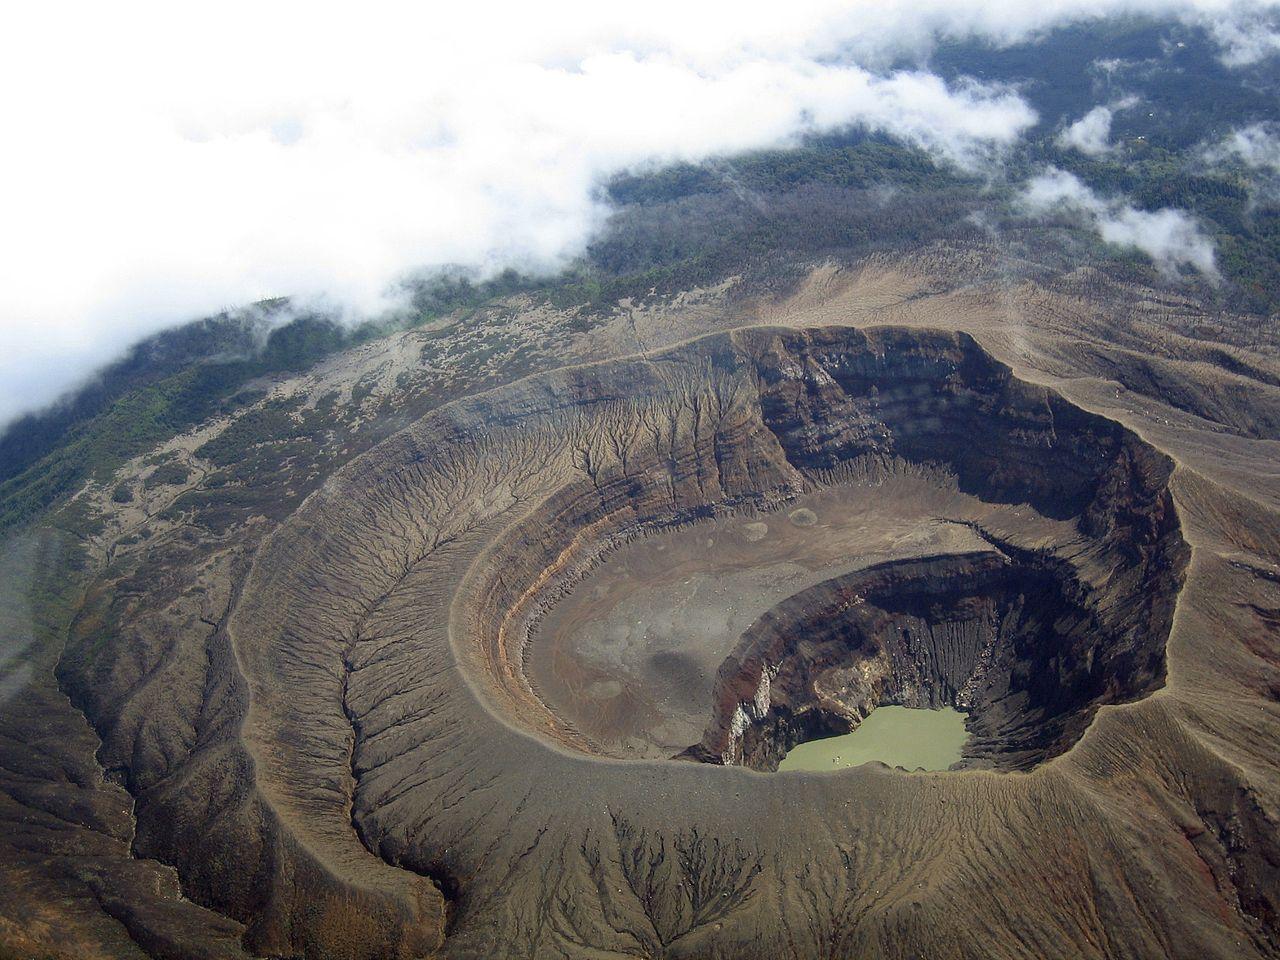 April 12, 2020. EN . Indonesia : Anak Krakatau , El Salvador : Santa Ana (Ilamatepec) , Costa Rica : Rincon de la Vieja , Kamchatka : Klyuchevskoy , Indonesia : Karangetang .